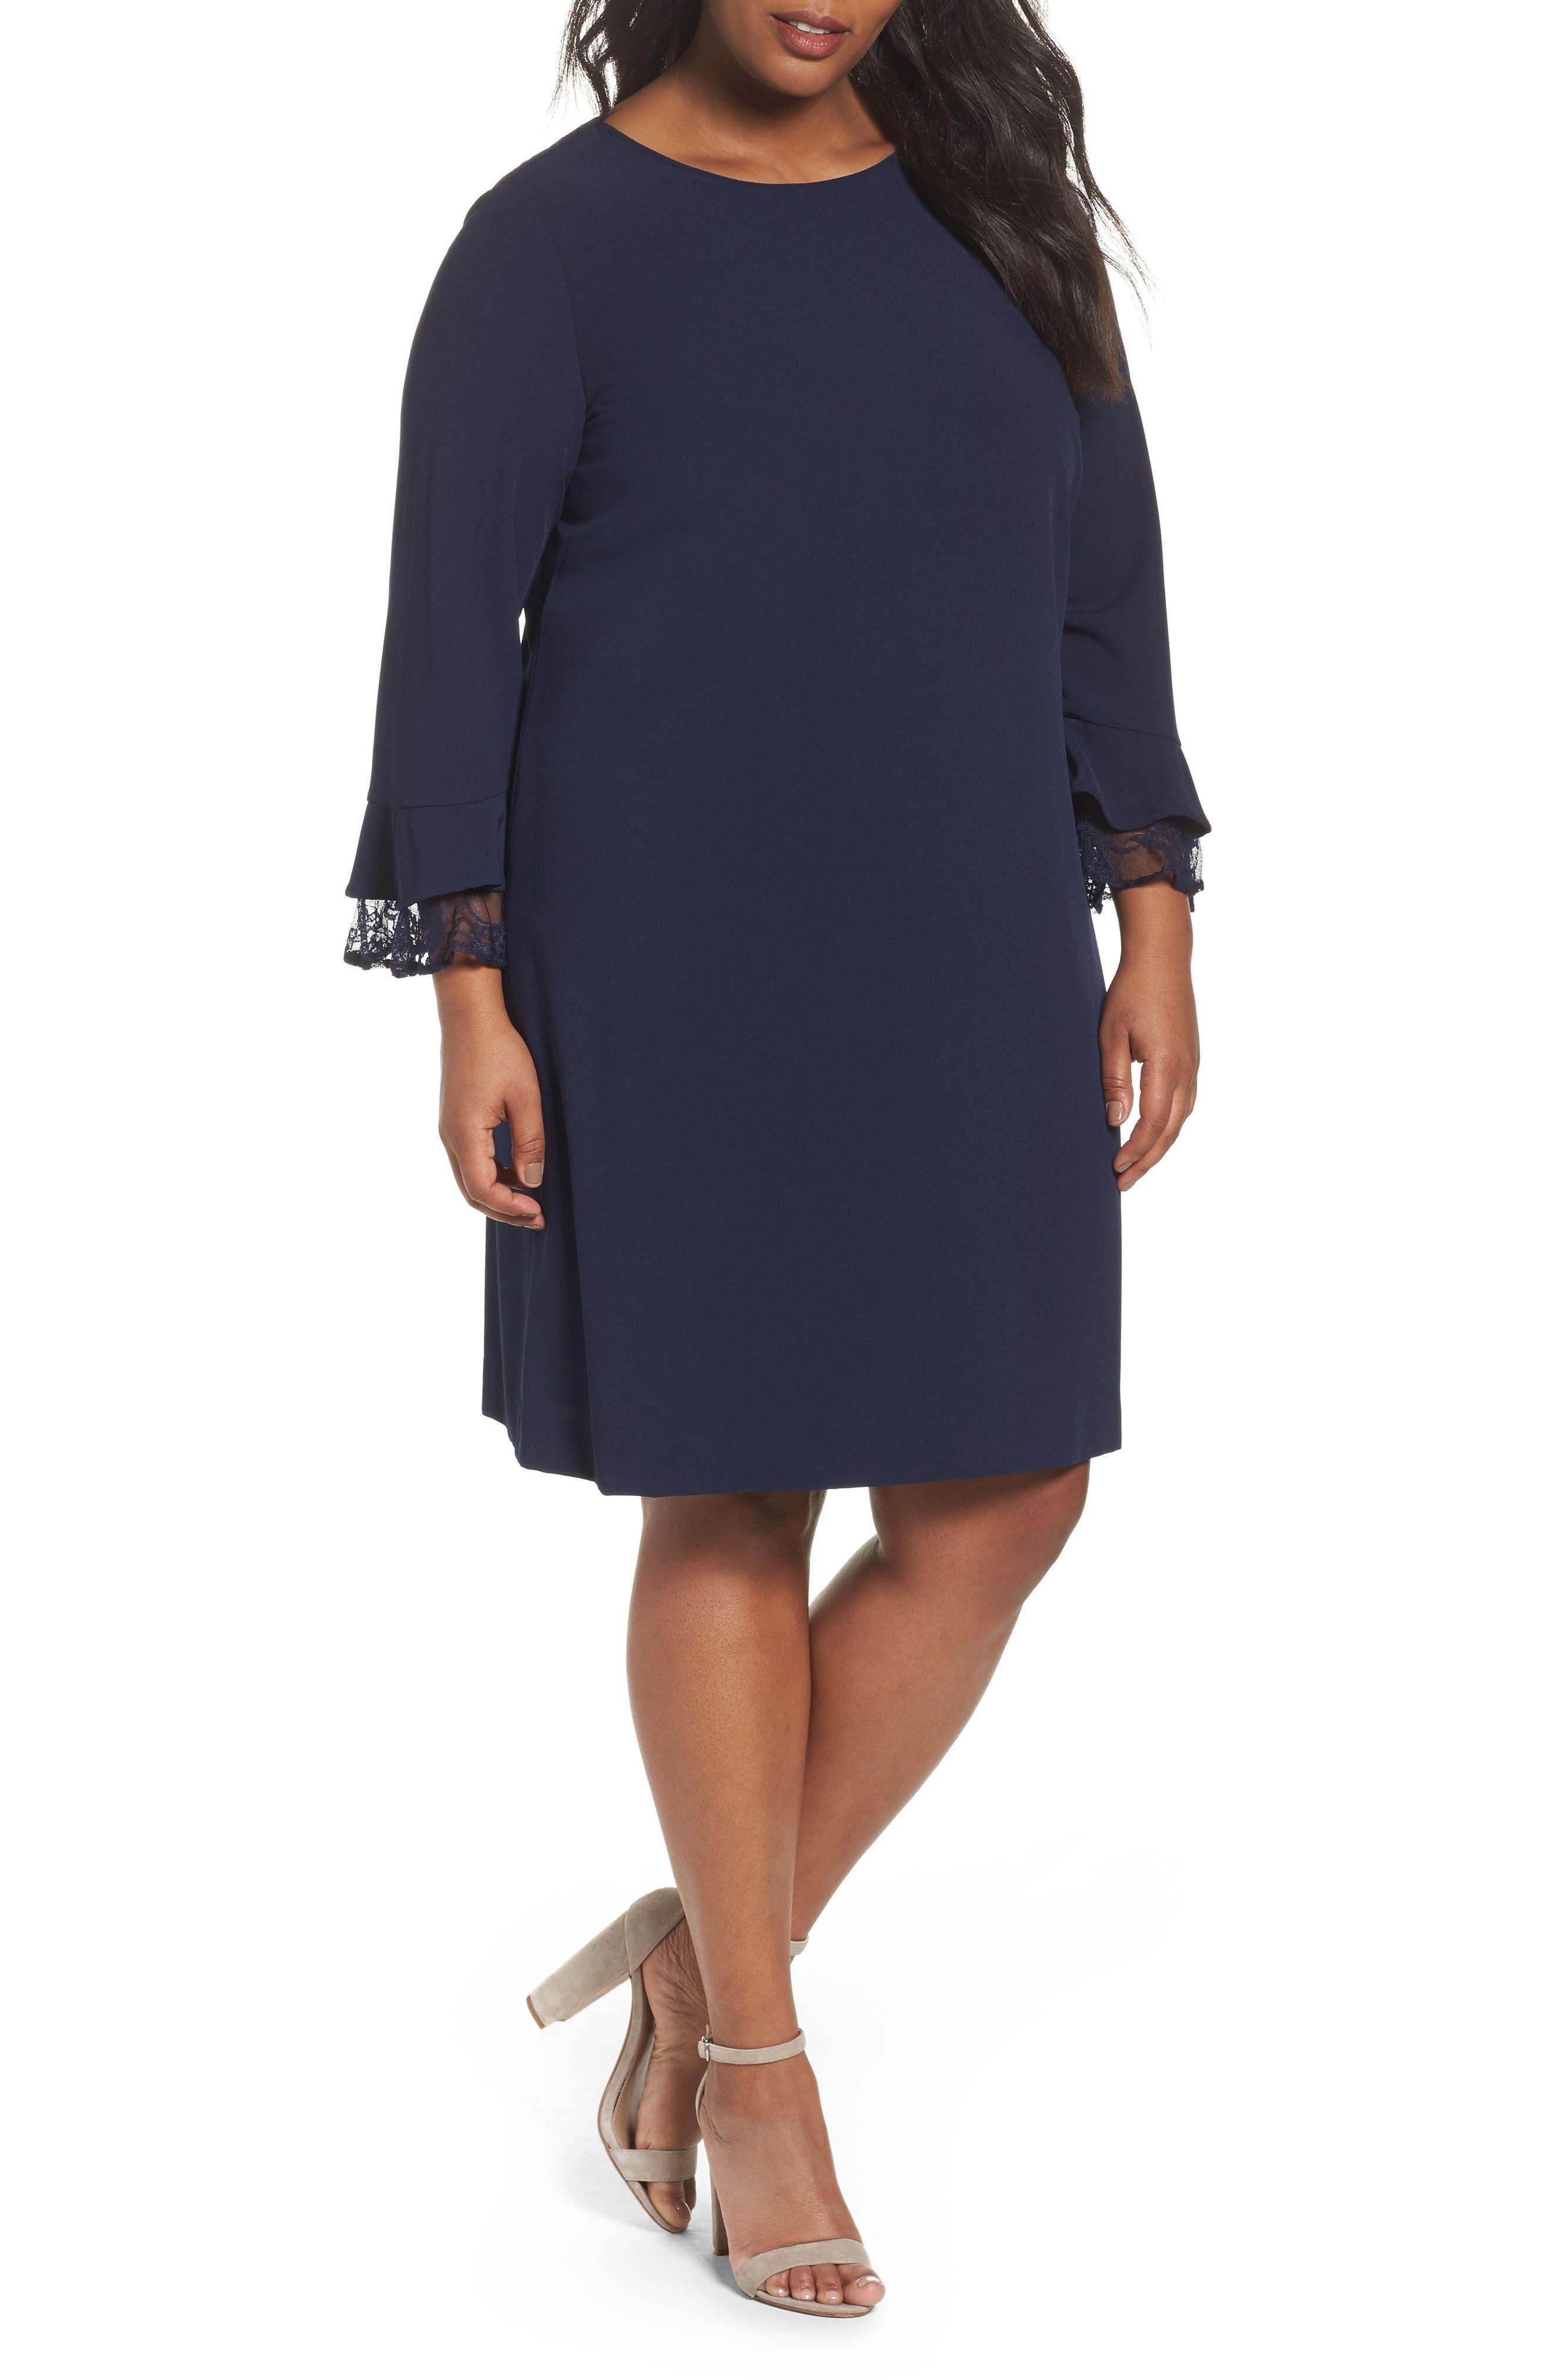 Alternate Image 1 Selected - Tahari Lace Trim Shift Dress (Plus Size)